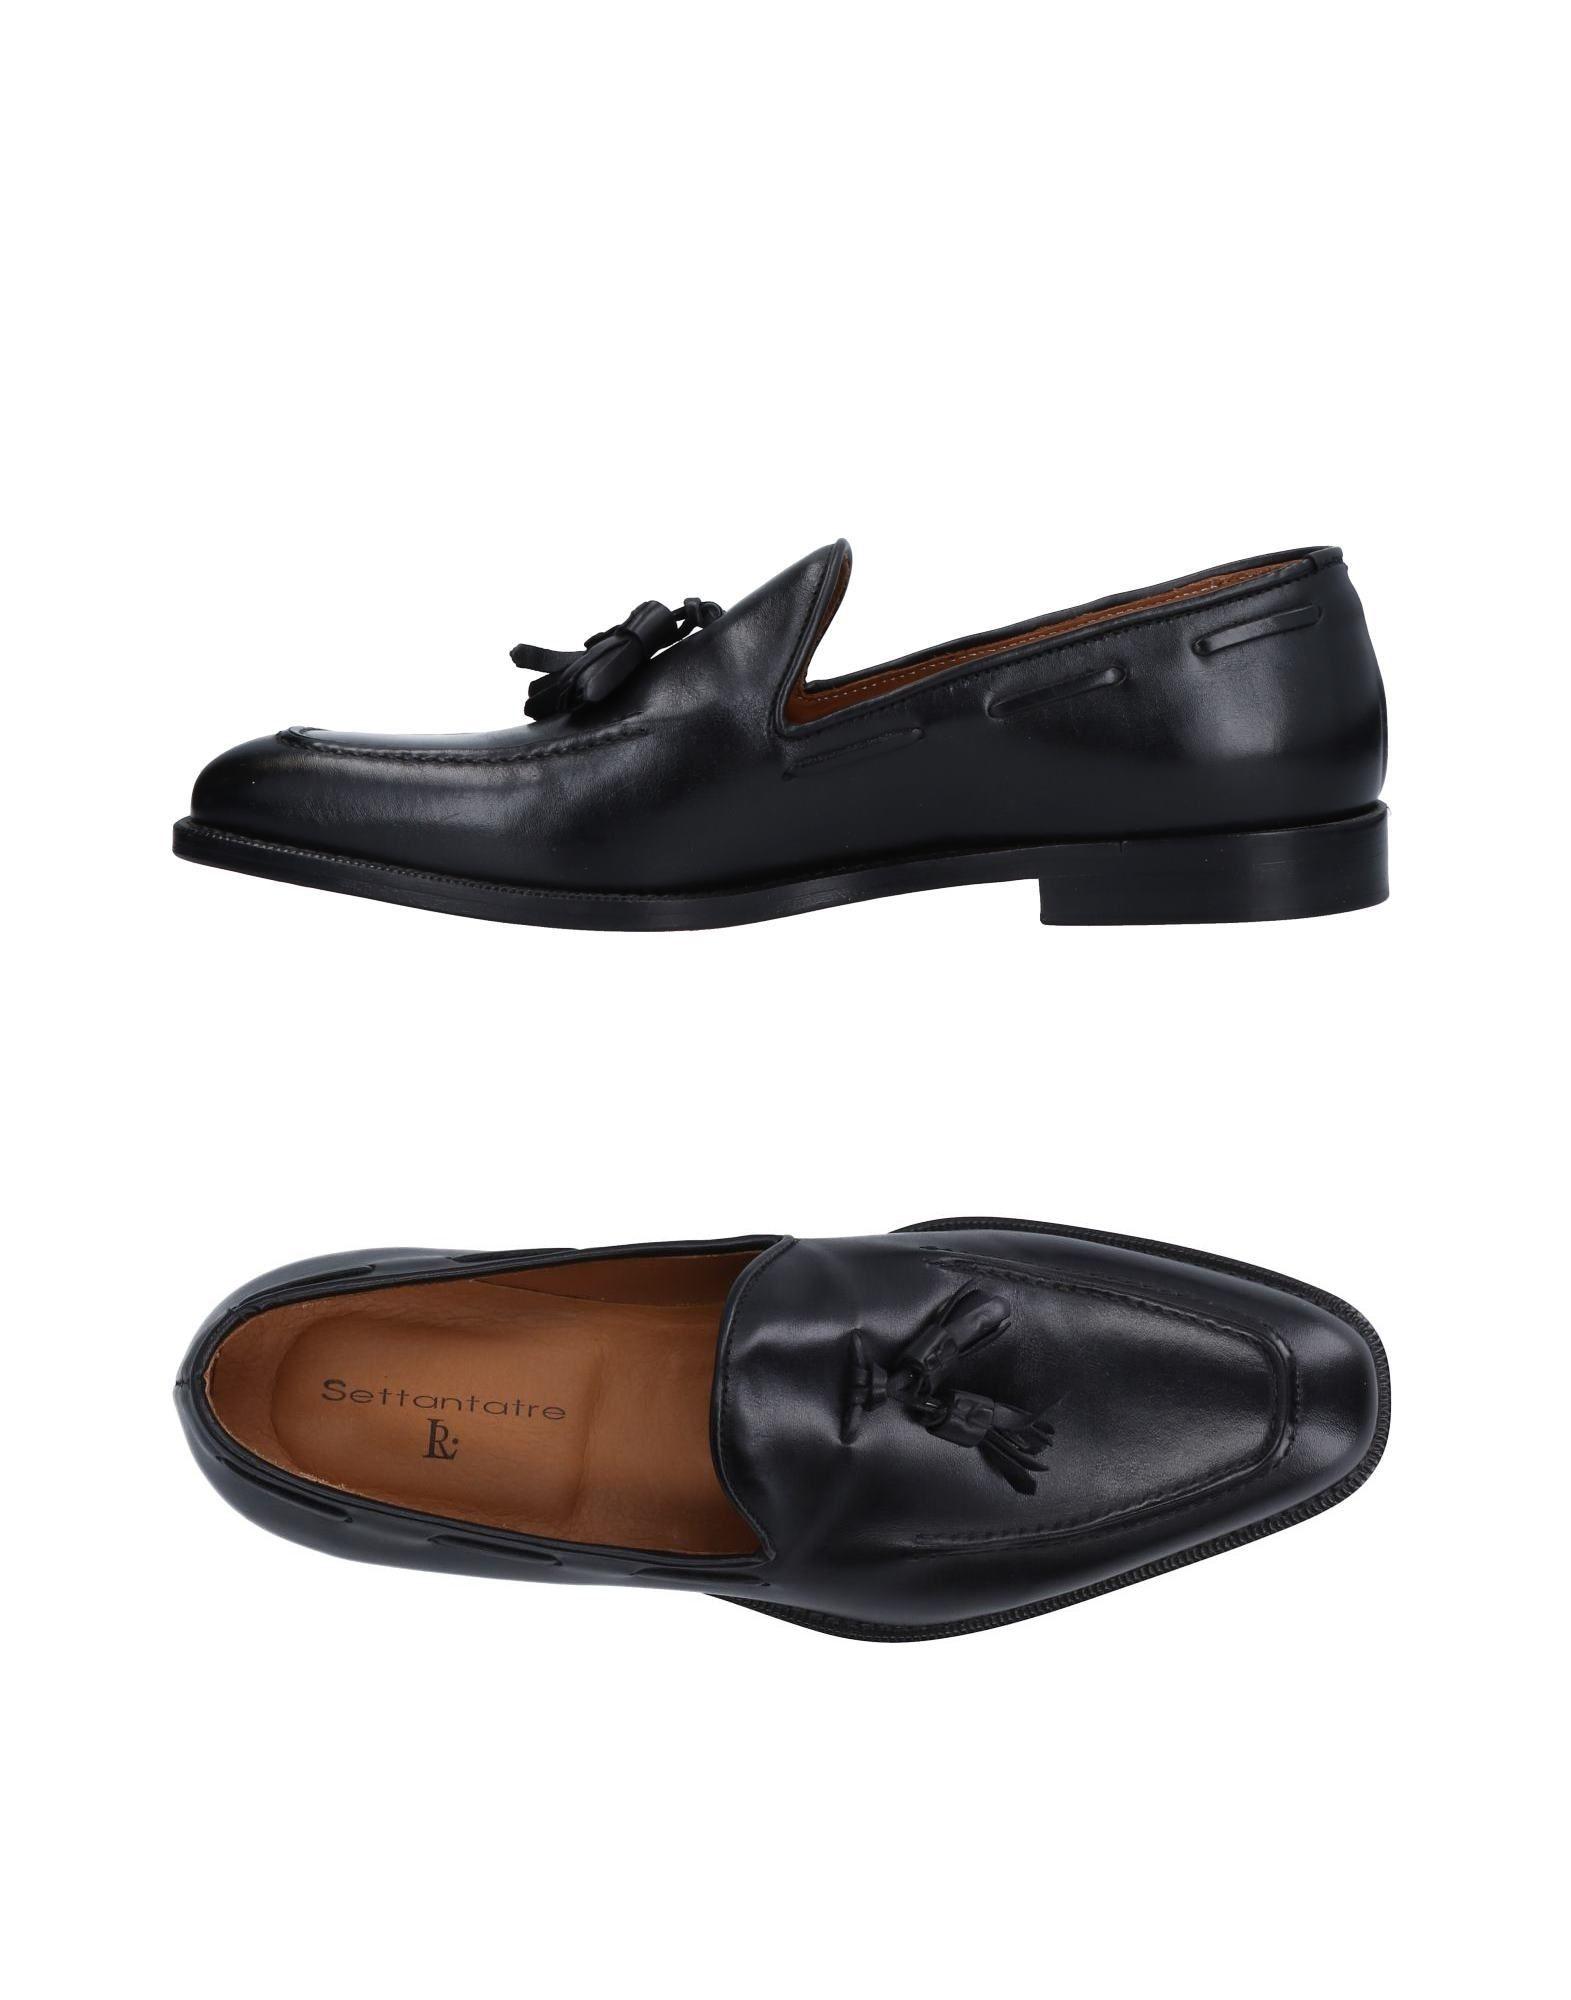 Settantatre Lr Mokassins Herren  11512524MC Gute Qualität beliebte Schuhe